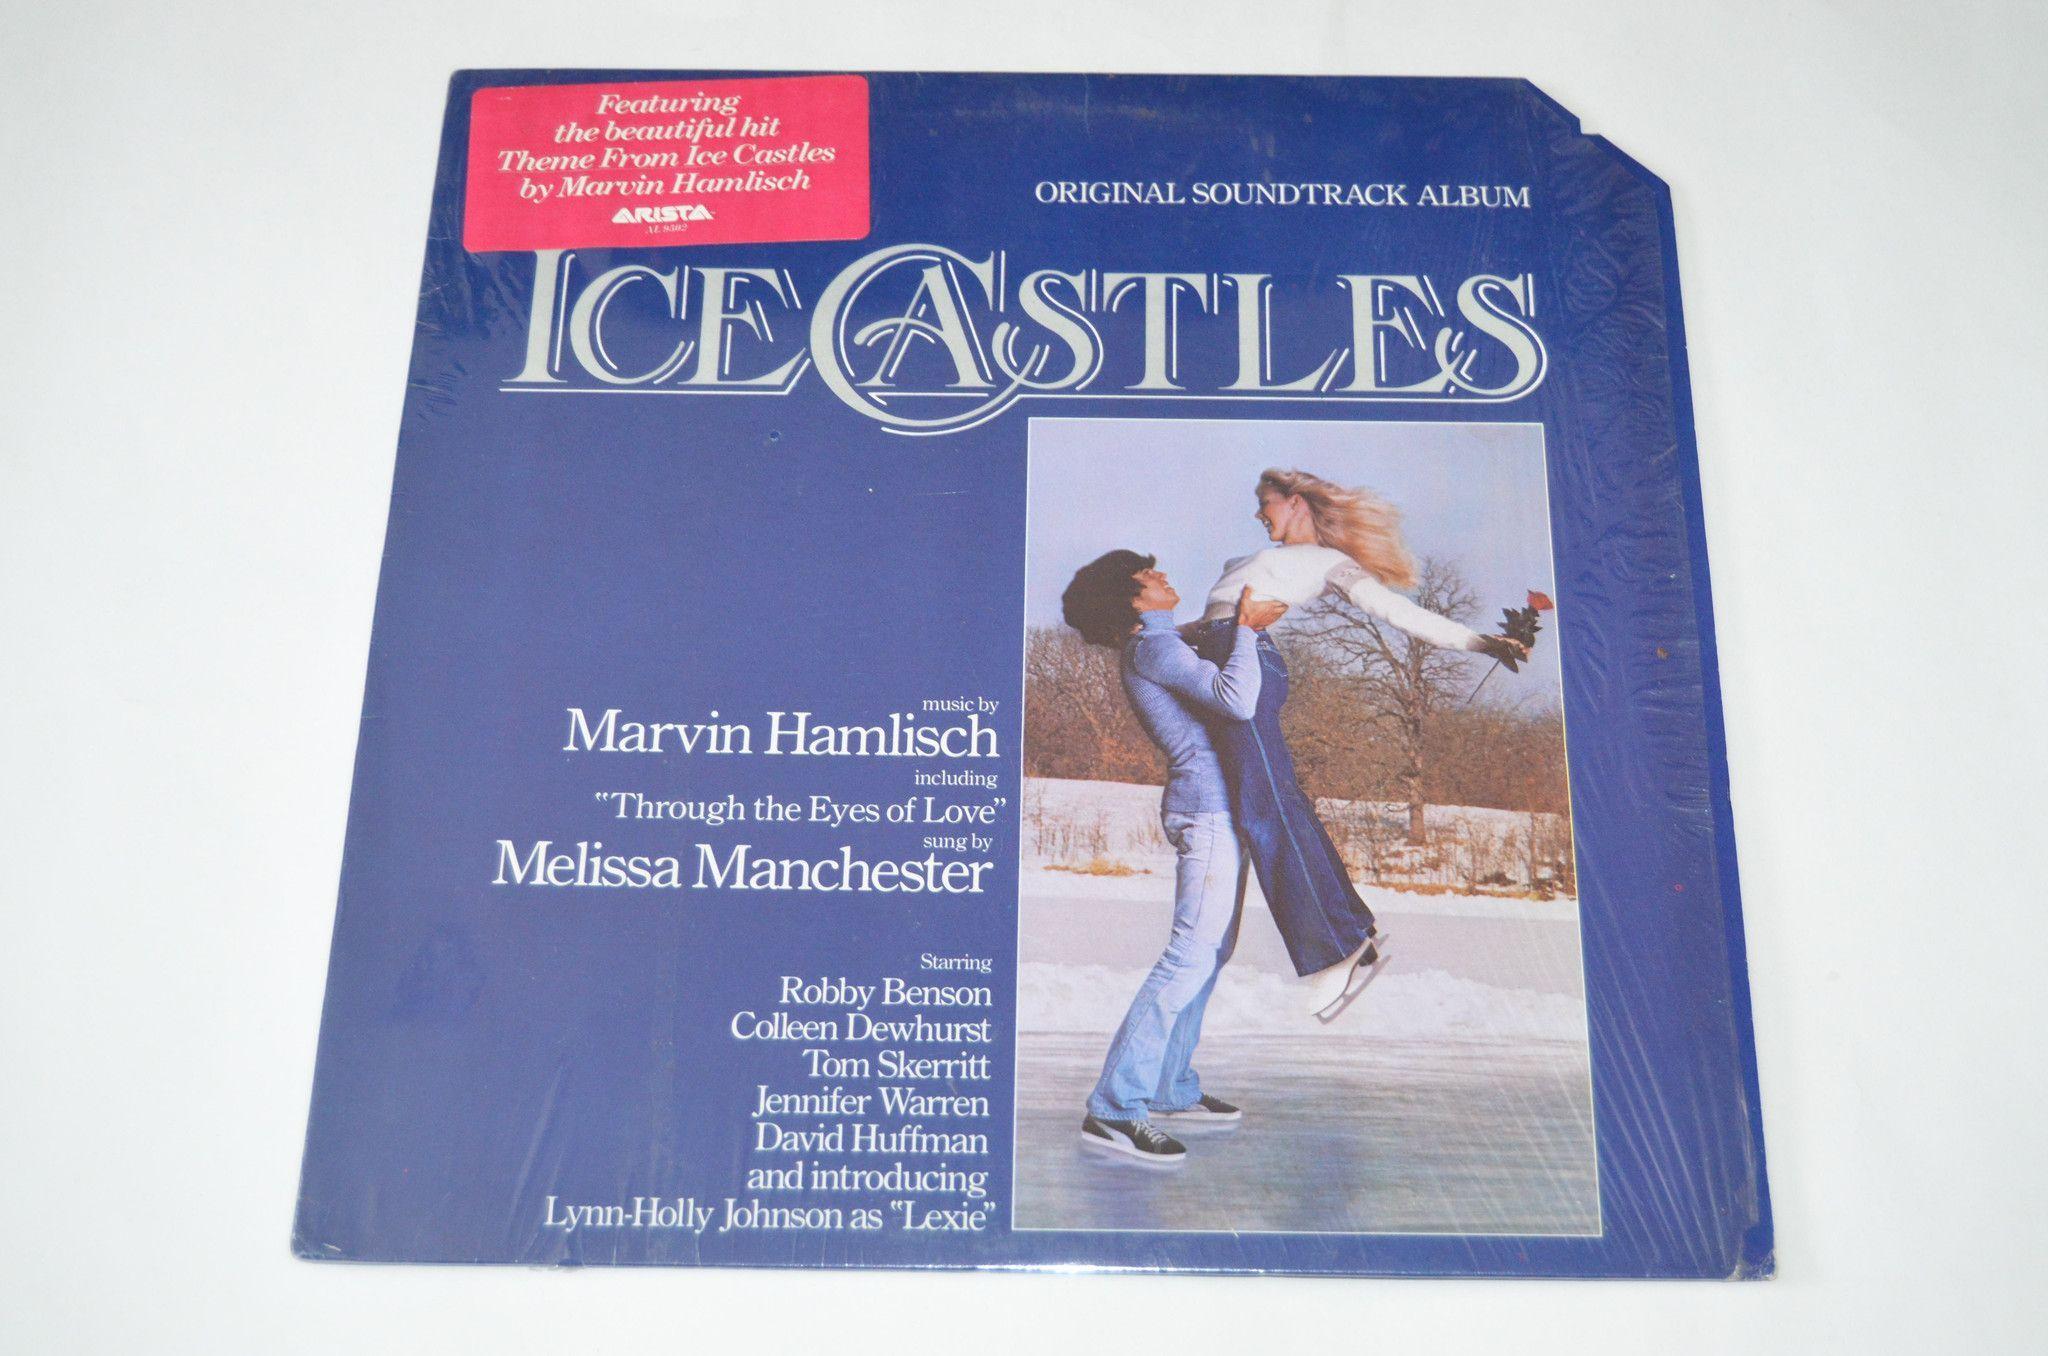 Ice Castles - Original Soundtrack Album